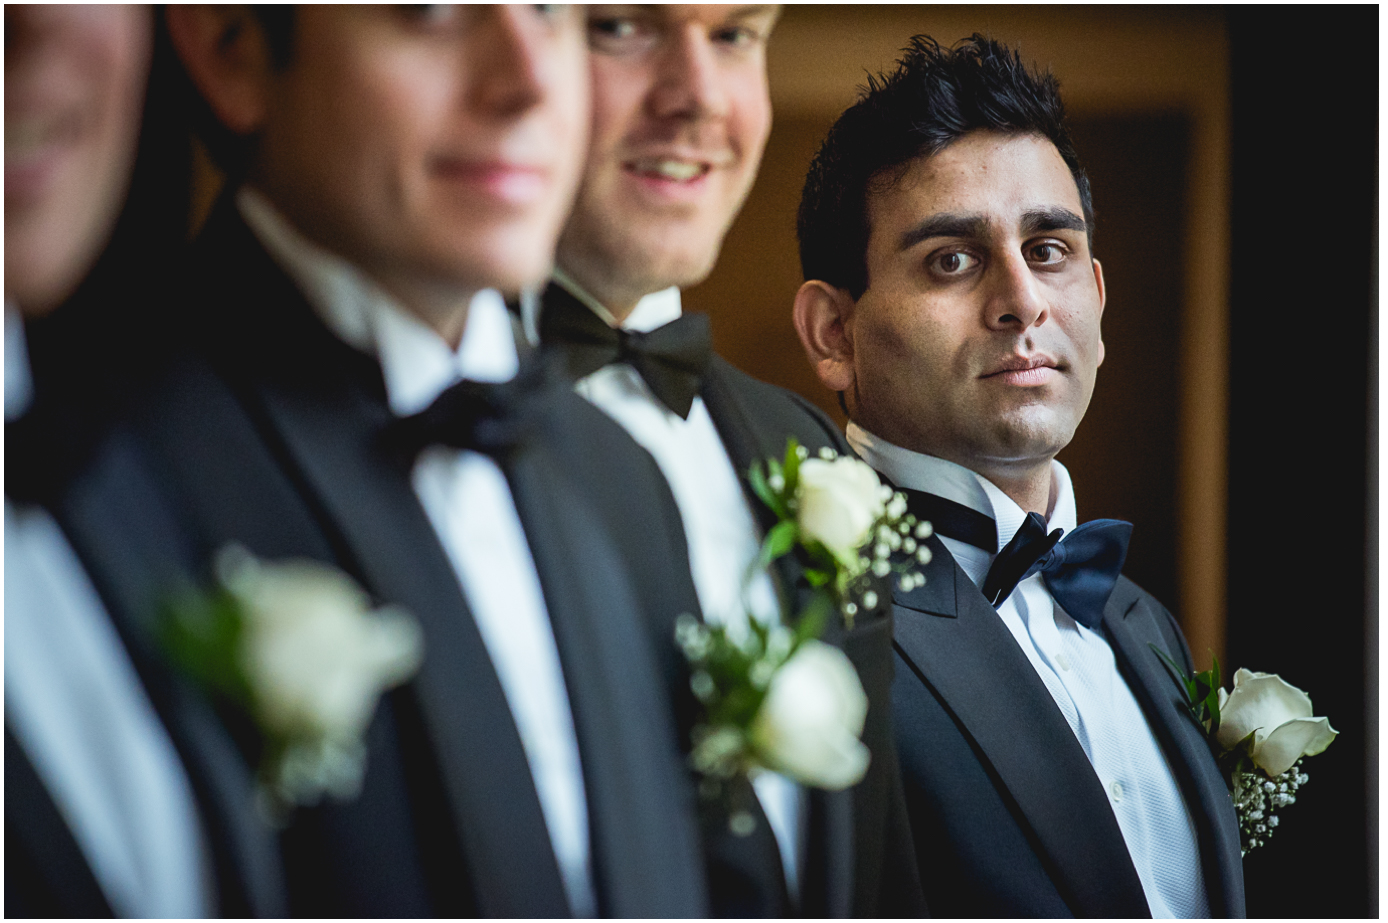 15a - Esmat and Angus - St. Ermin's Hotel London wedding photographer